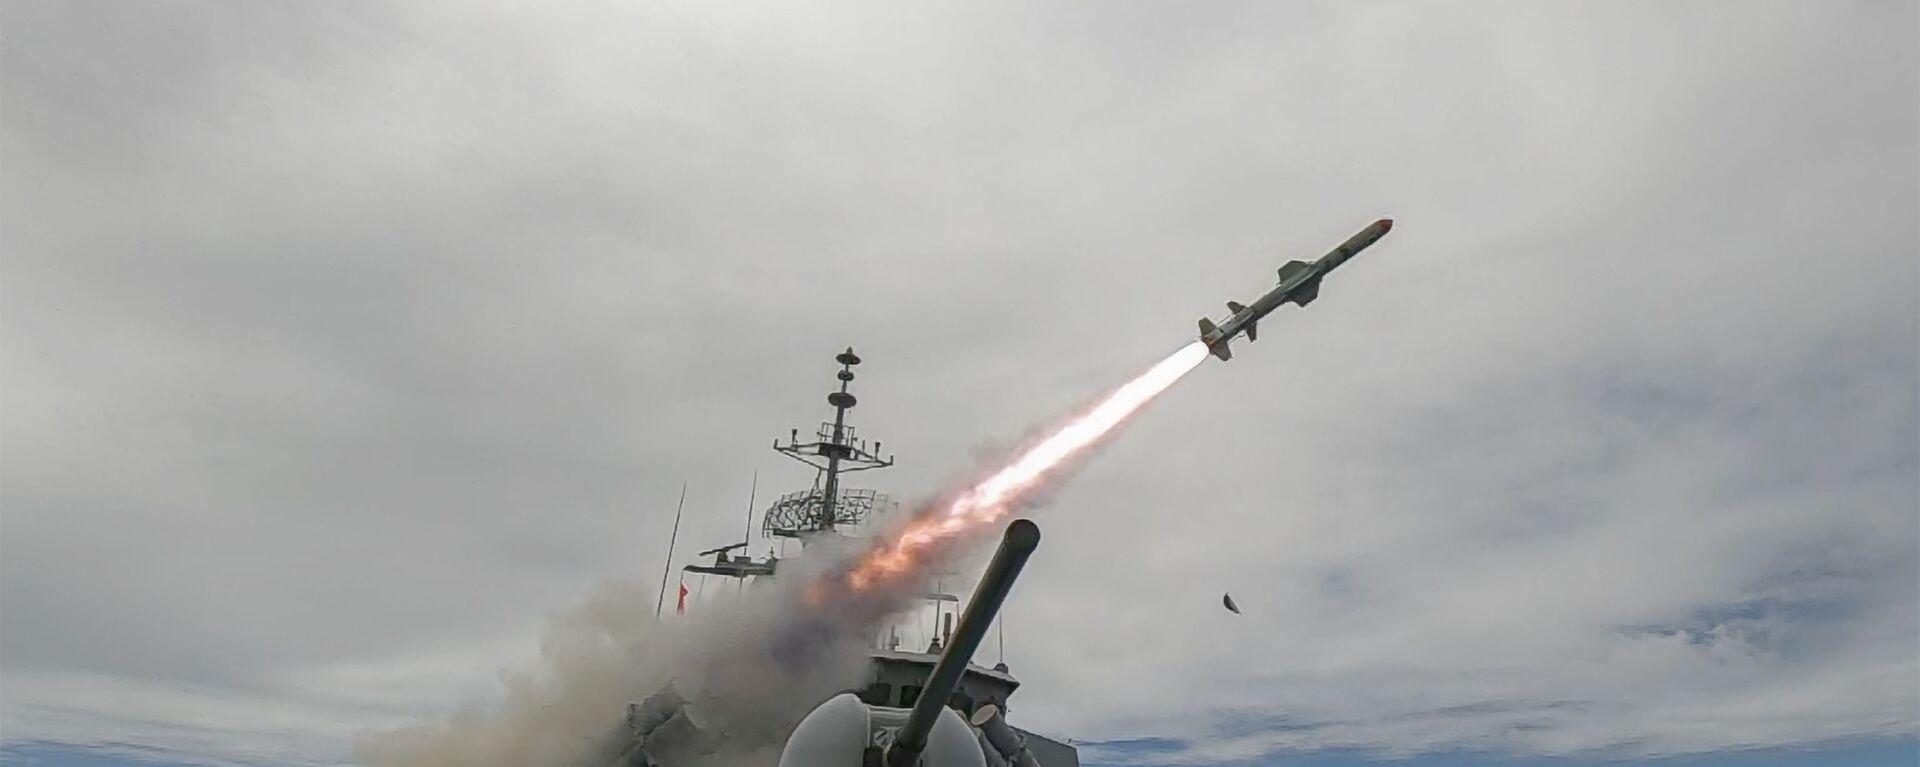 Royal Australian Navy ship HMAS Stuart (FFH 153) conducts a live Harpoon Missile Firing exercise during Rim of the Pacific (RIMPAC) 2020. - Sputnik International, 1920, 17.09.2021